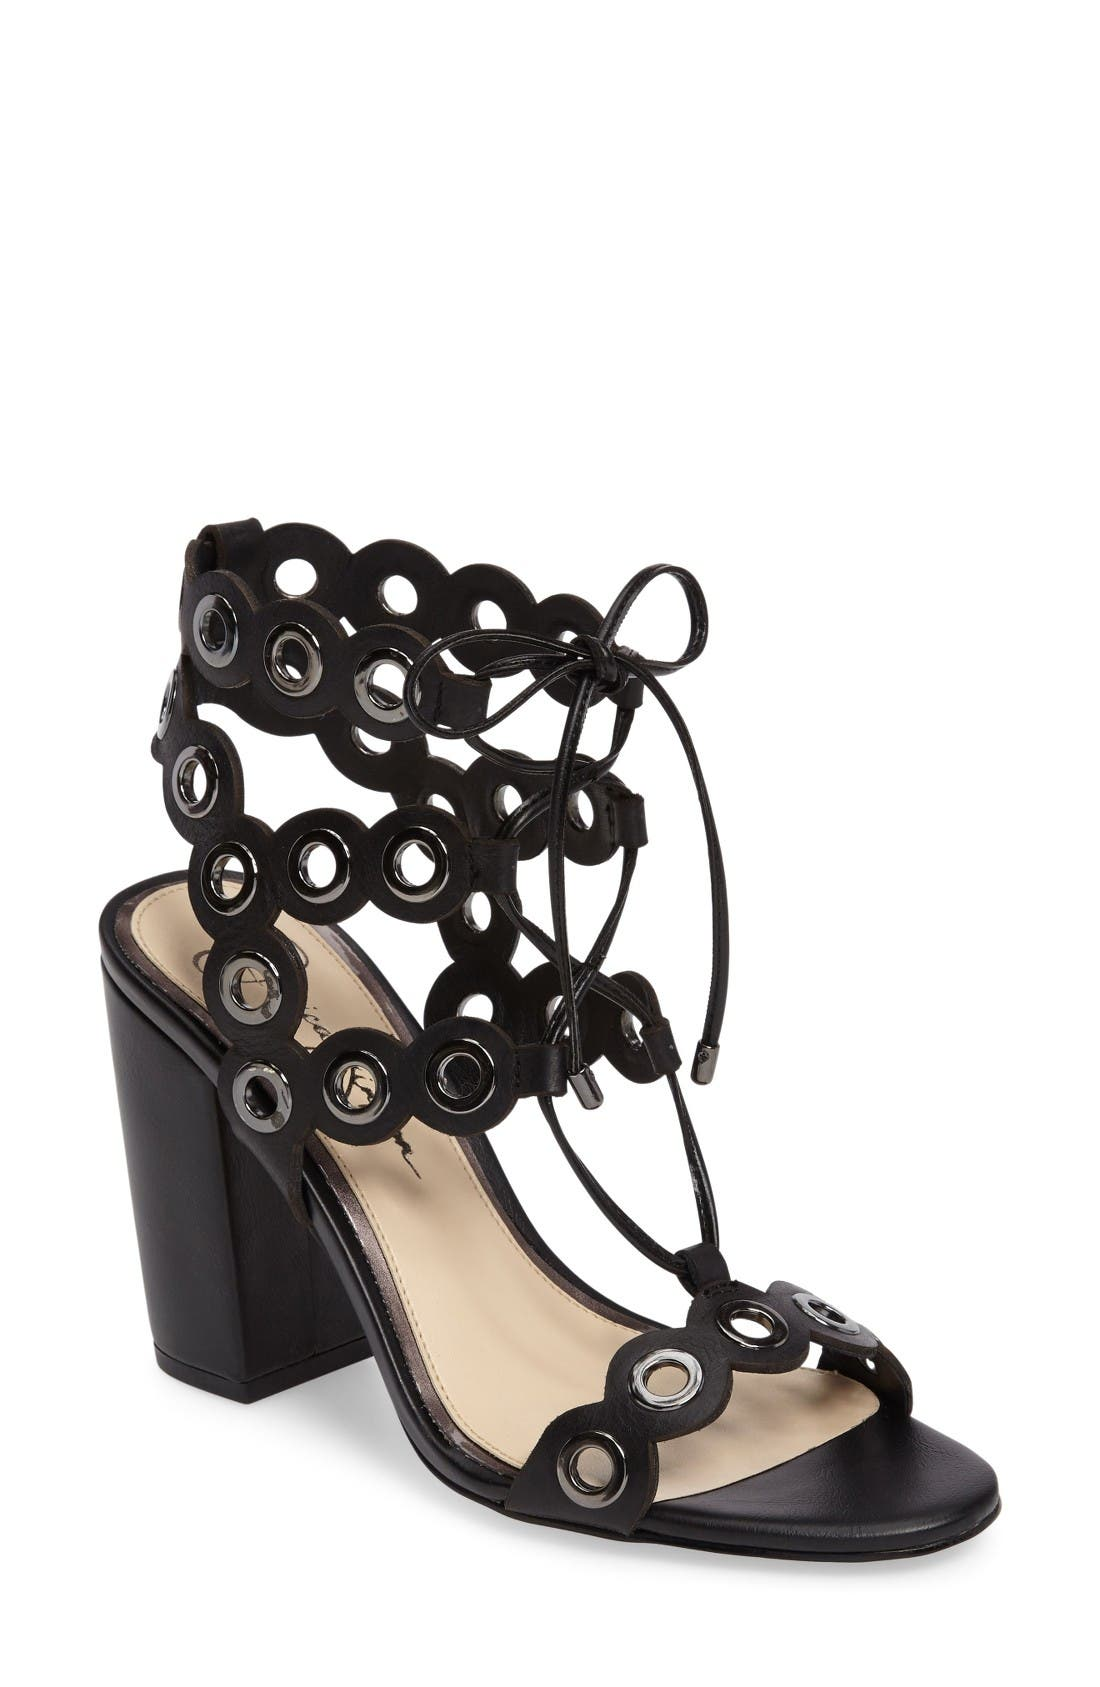 Main Image - Jessica Simpson Kariss Lace-Up Sandal (Women)